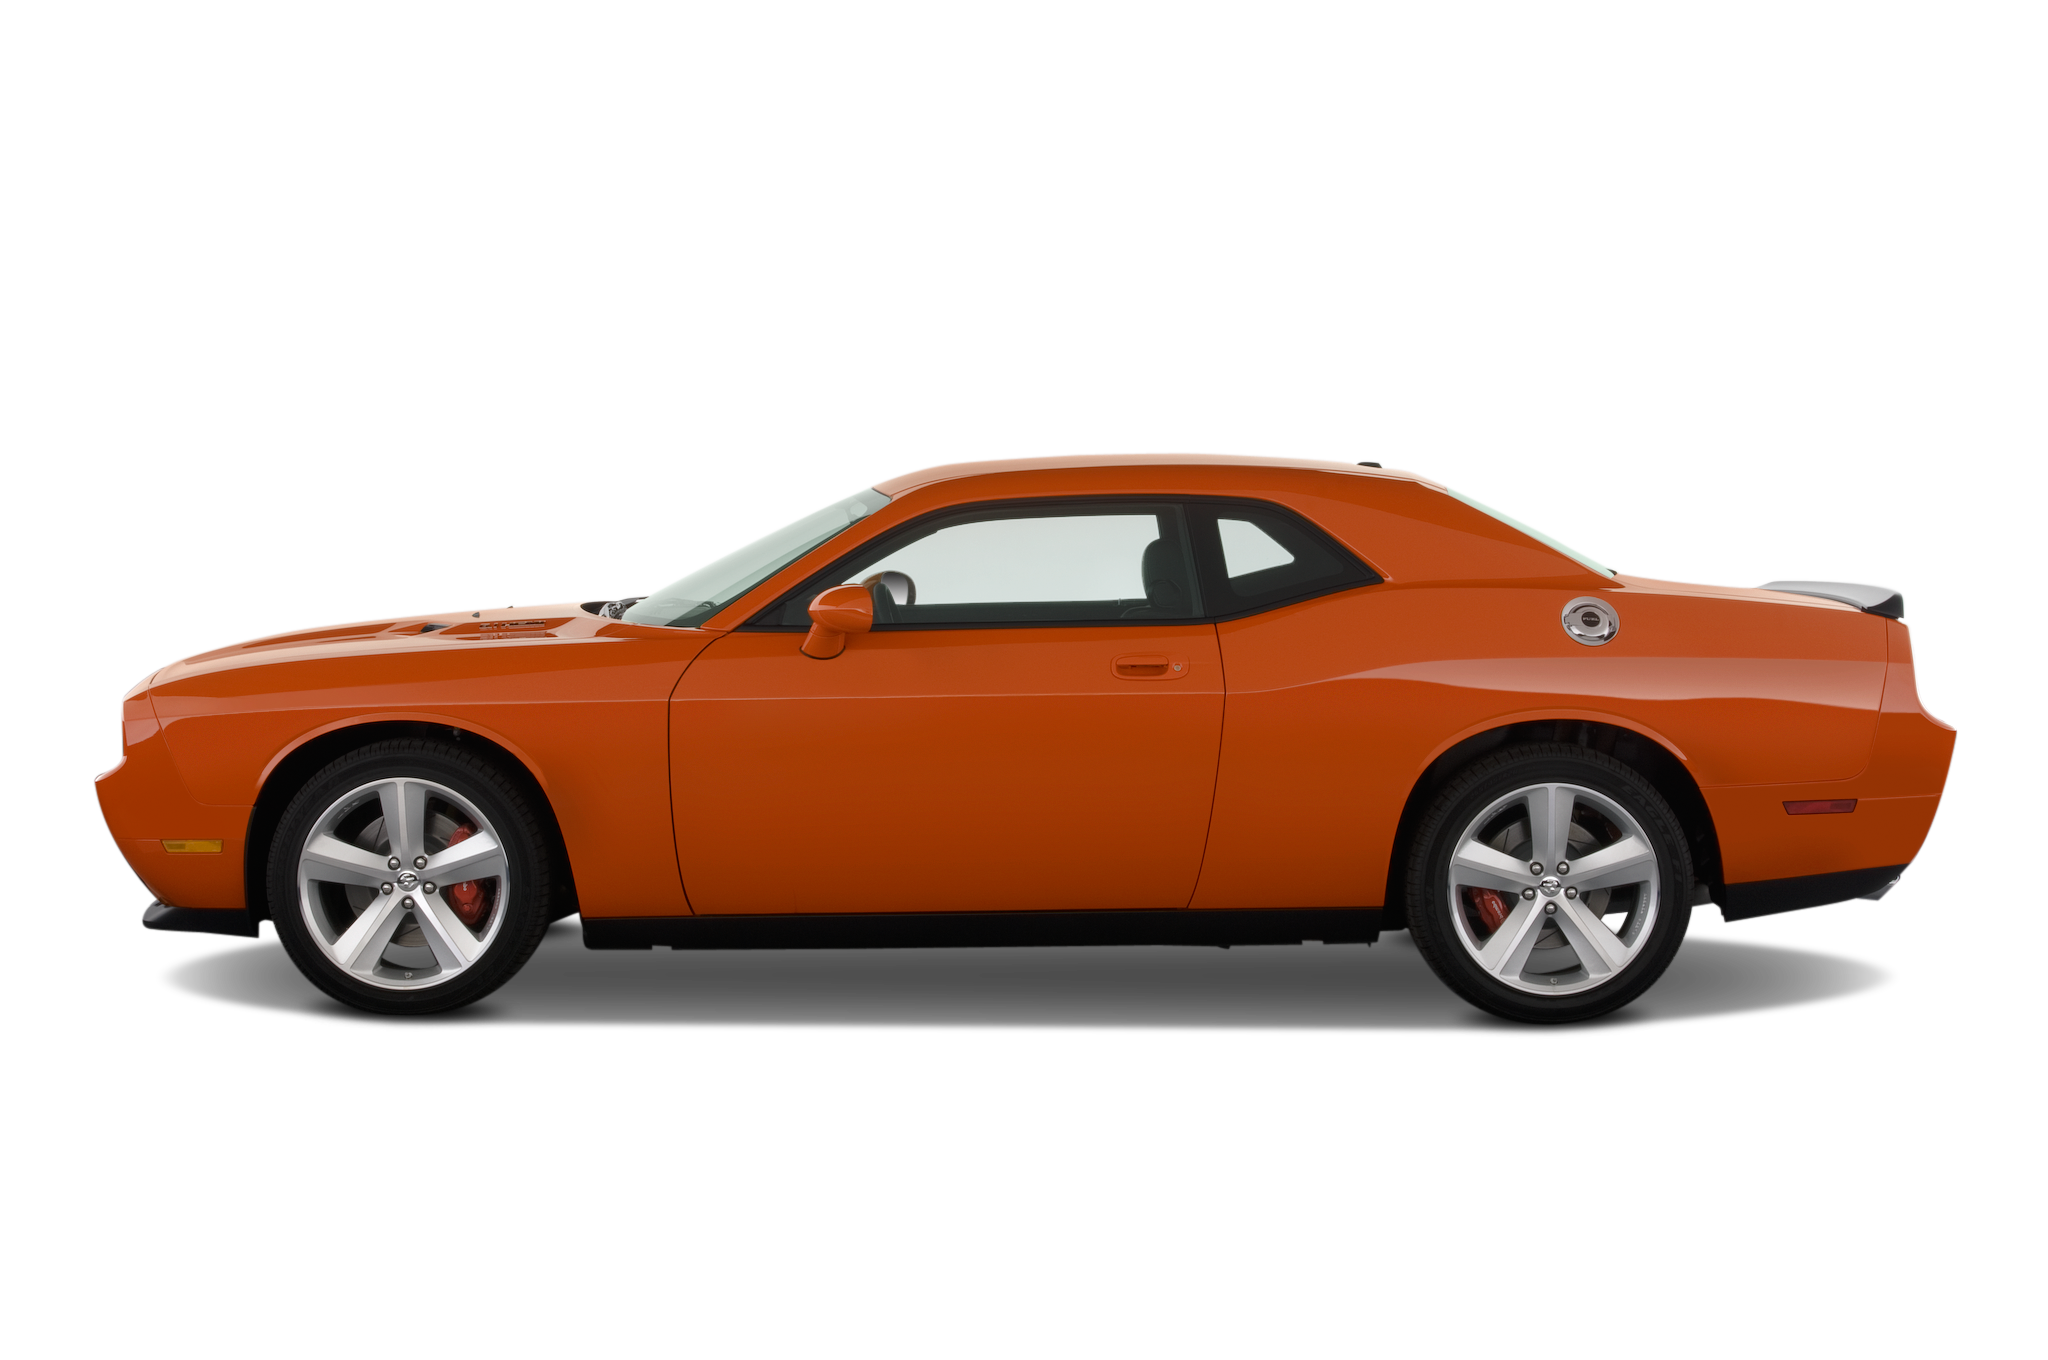 2010 Dodge Challenger SRT-8 Limited Edition - Dodge Sport Coupe ...